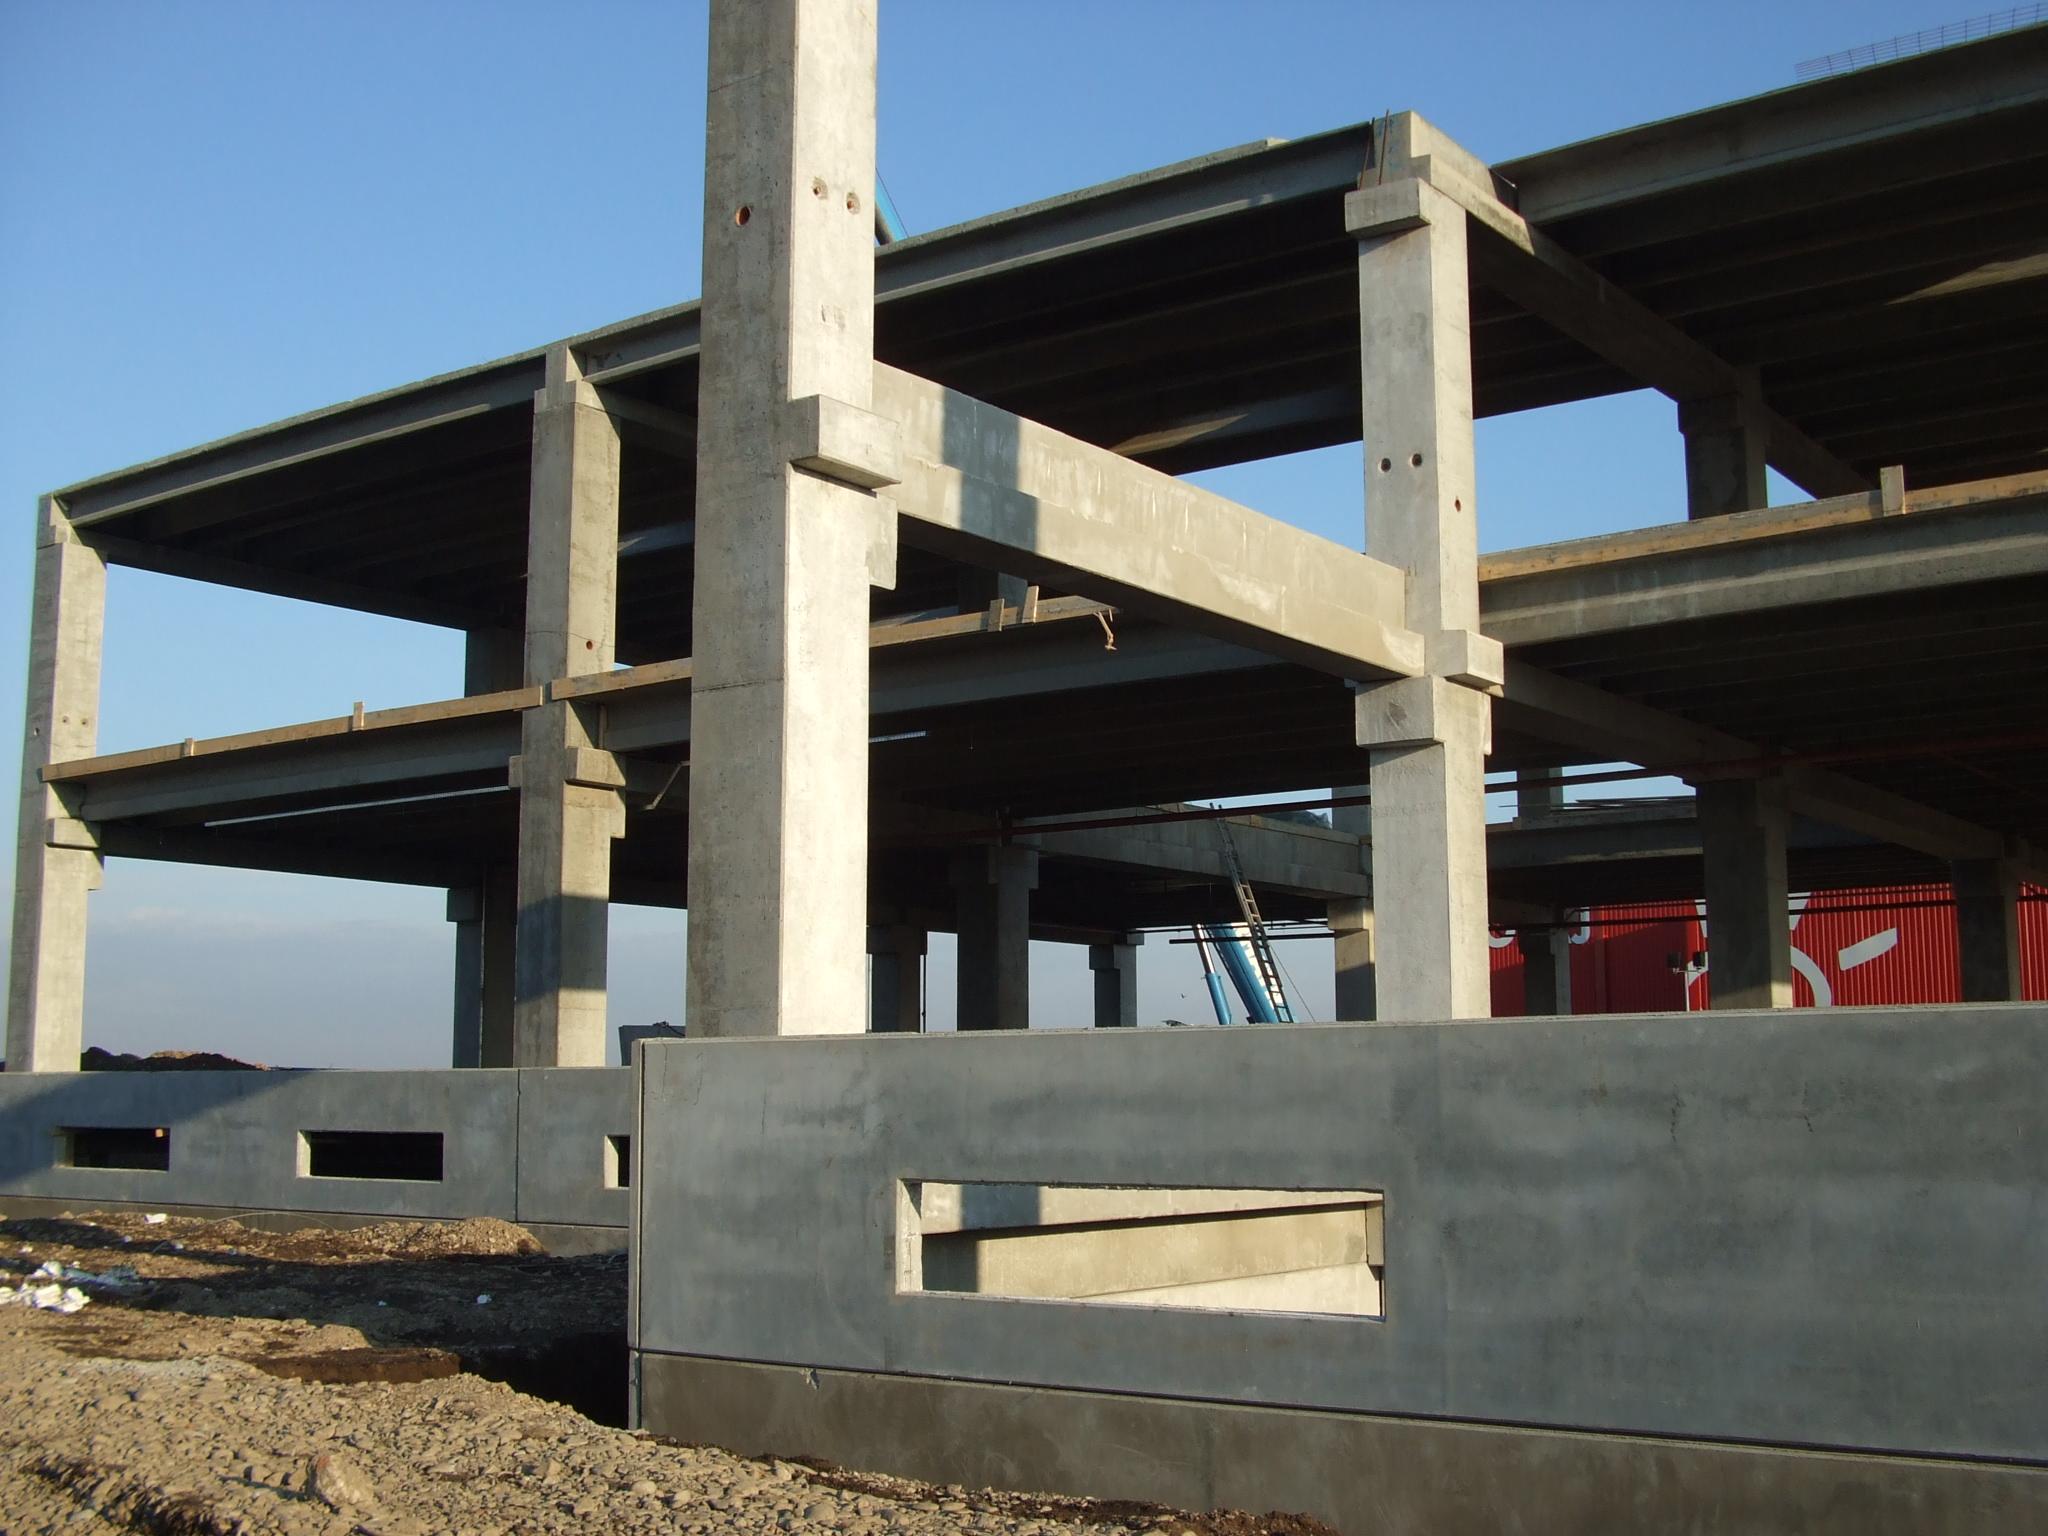 Hale industriale cu elemente structurale prefabricate din beton armat MAGNETTI - Poza 5